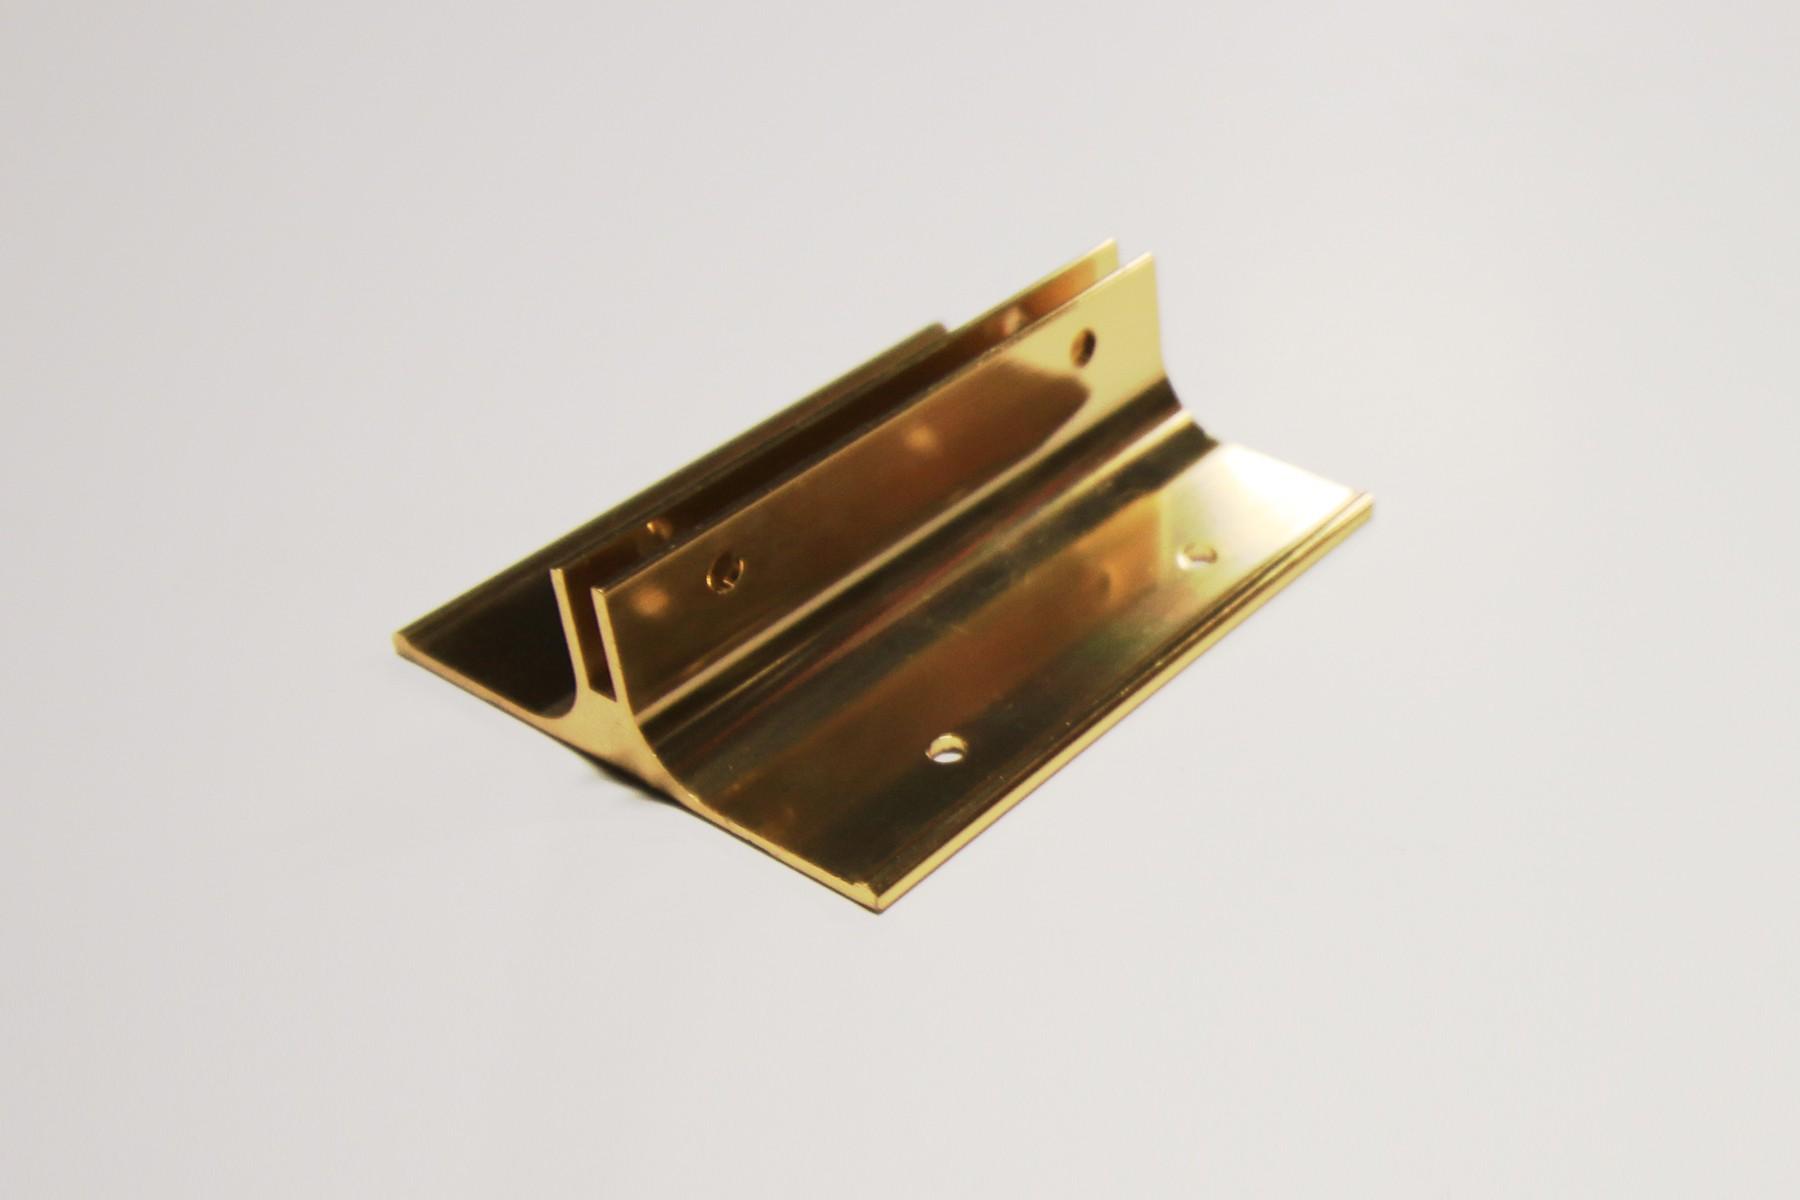 2-1/2 x 2 Corridor Bracket (1/8), Gold